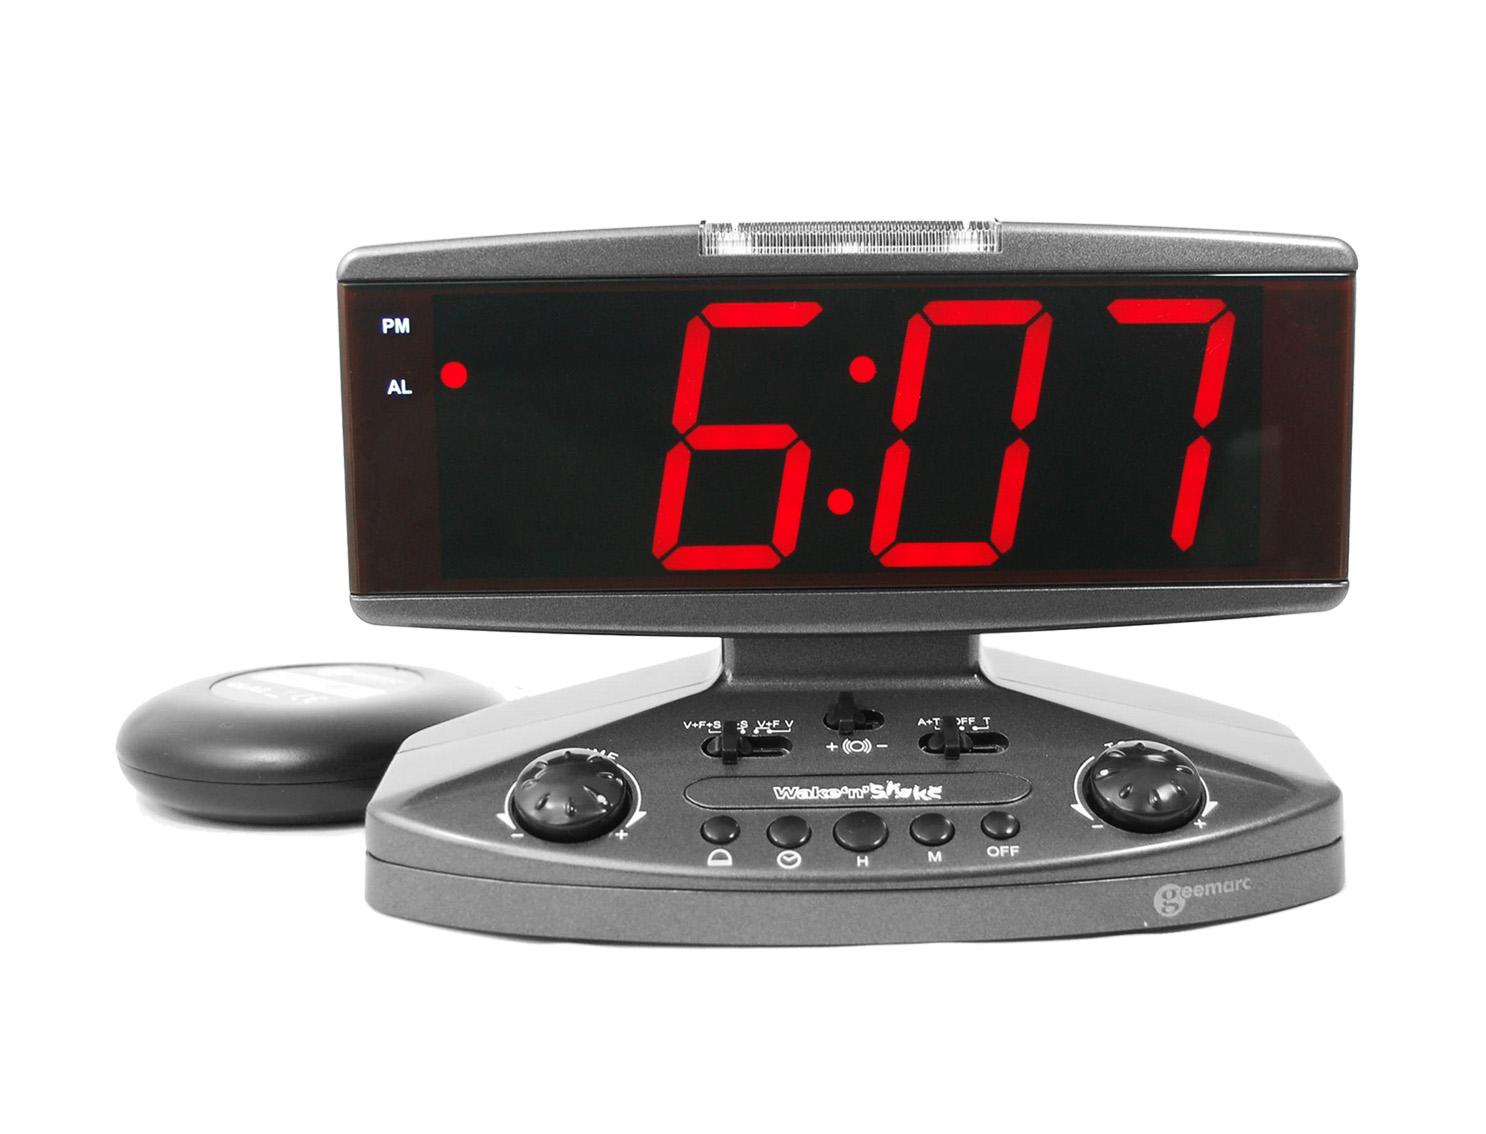 WECKER Jumbowecker 95dB Blitz & Vibration Wake n' Shake vibrierdender Uhr